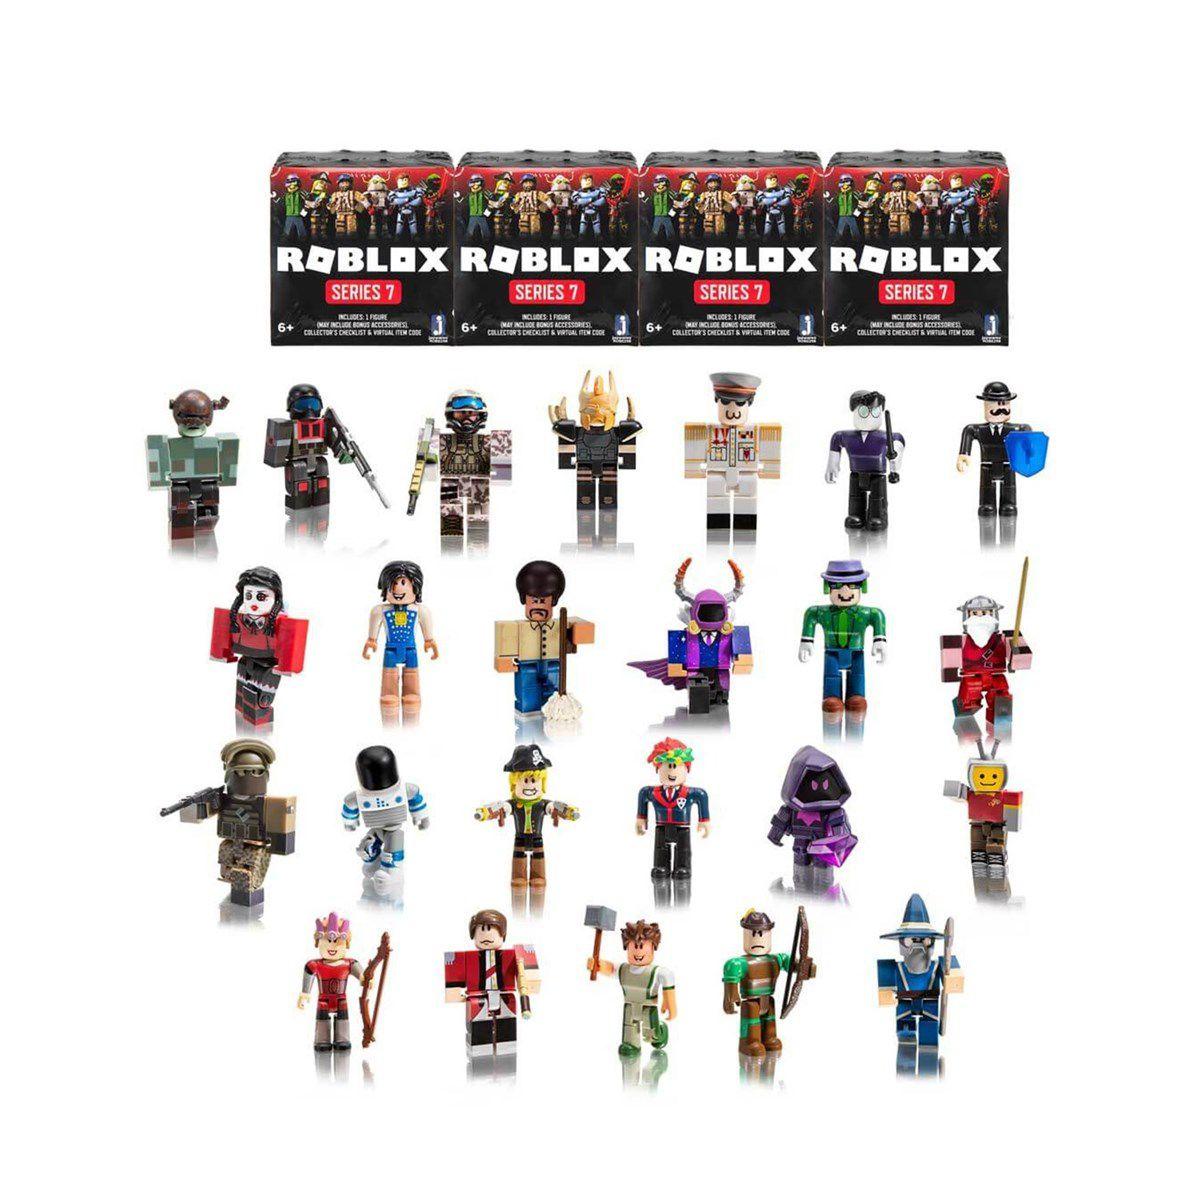 Boneco Roblox Figura Surpresa e Acessórios + Código Virtual